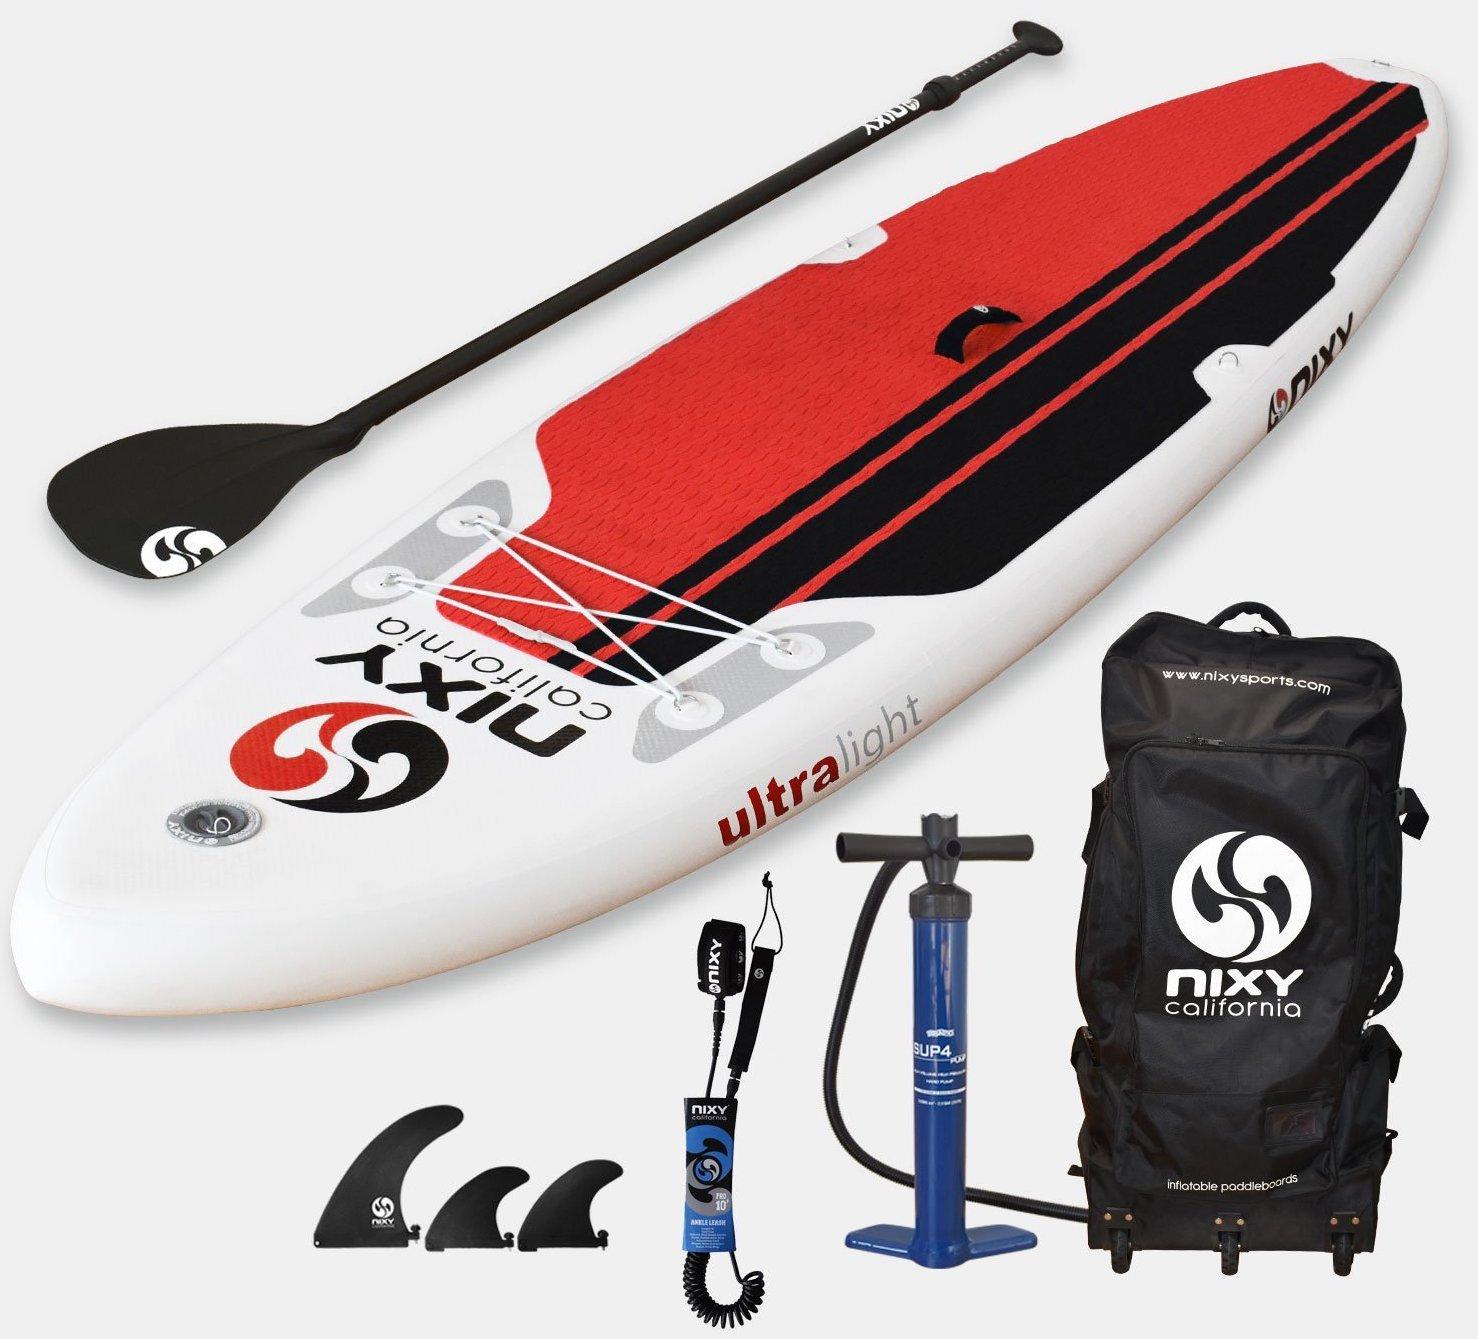 NIXY inflatable SUP ultra light